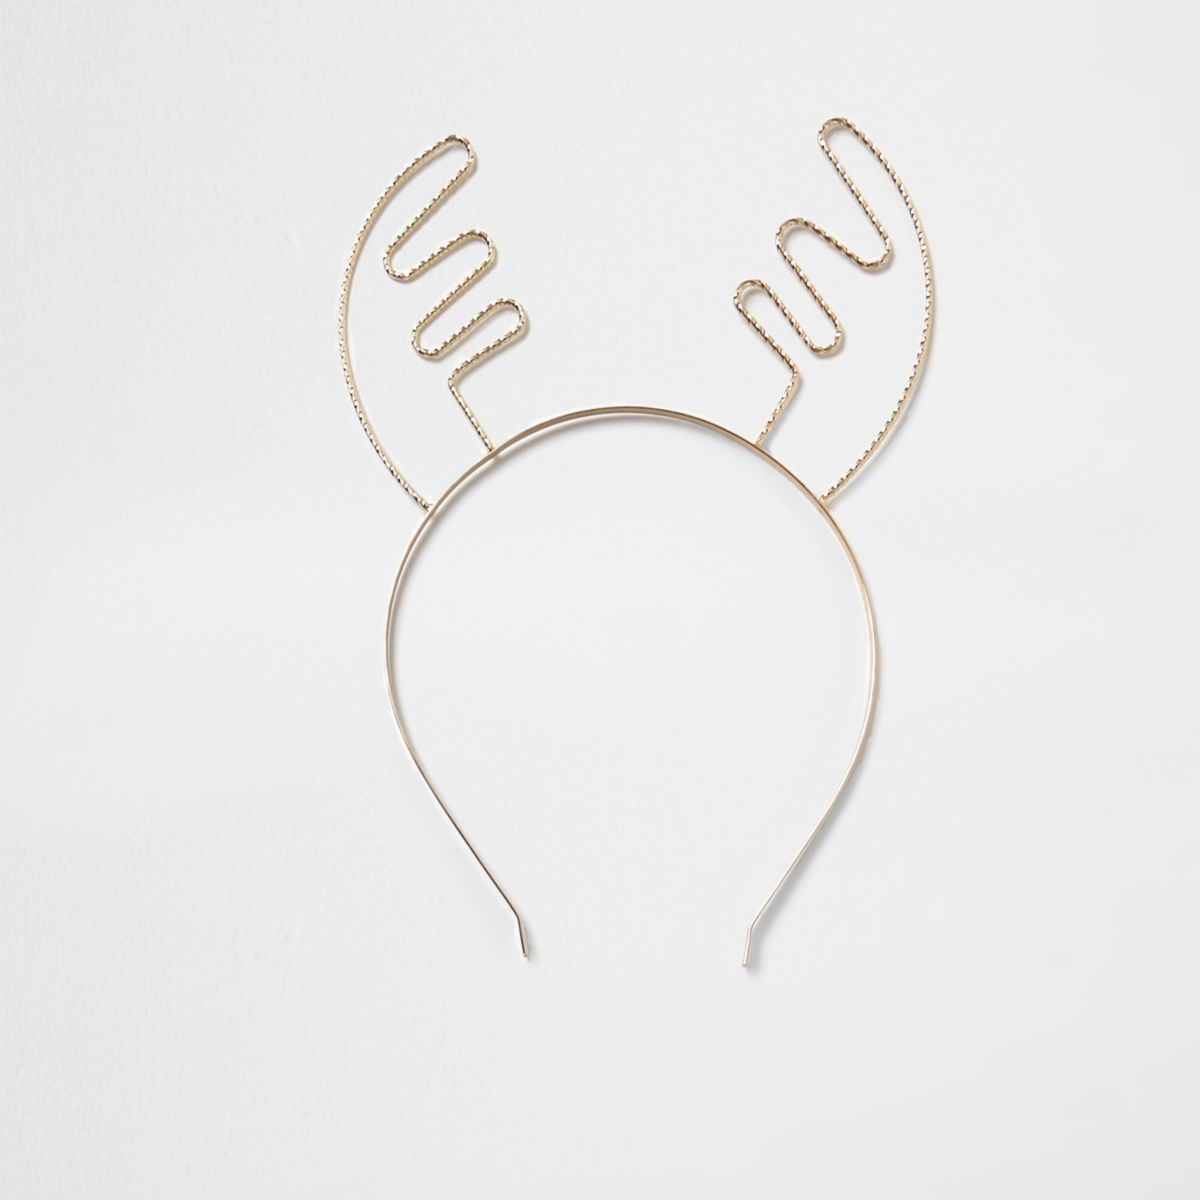 Gold tone Christmas reindeer antler hair band